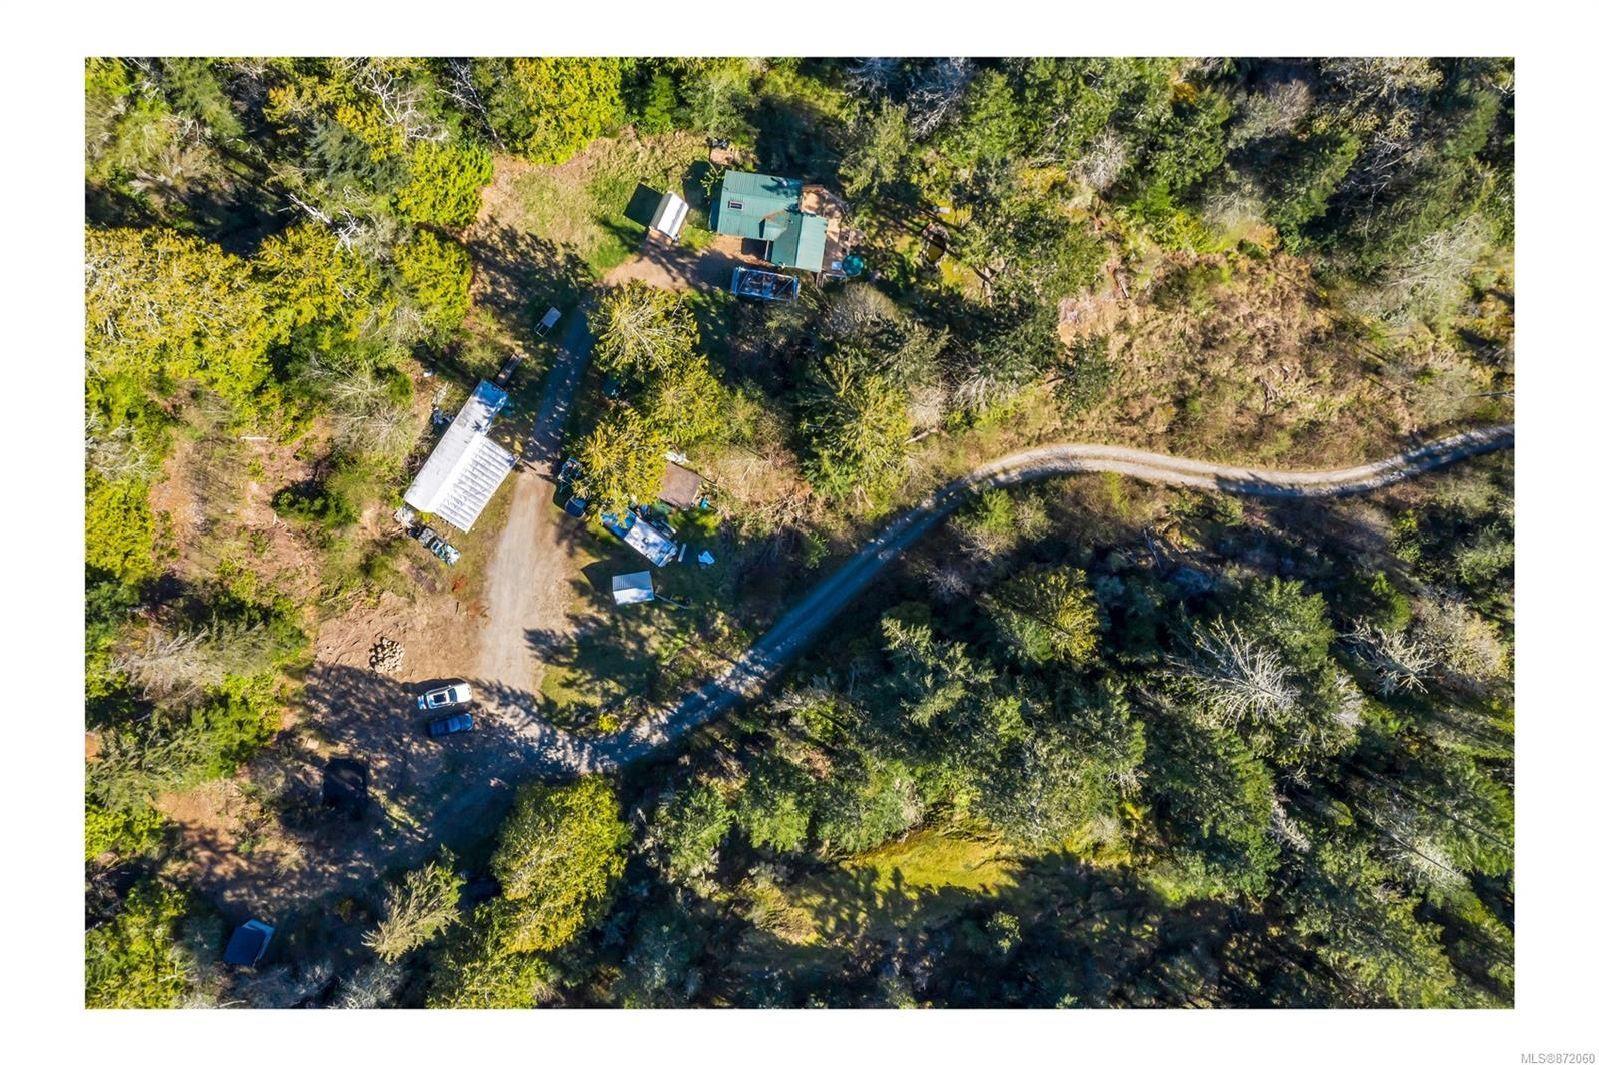 Main Photo: 6787 East Sooke Rd in : Sk East Sooke Land for sale (Sooke)  : MLS®# 872060